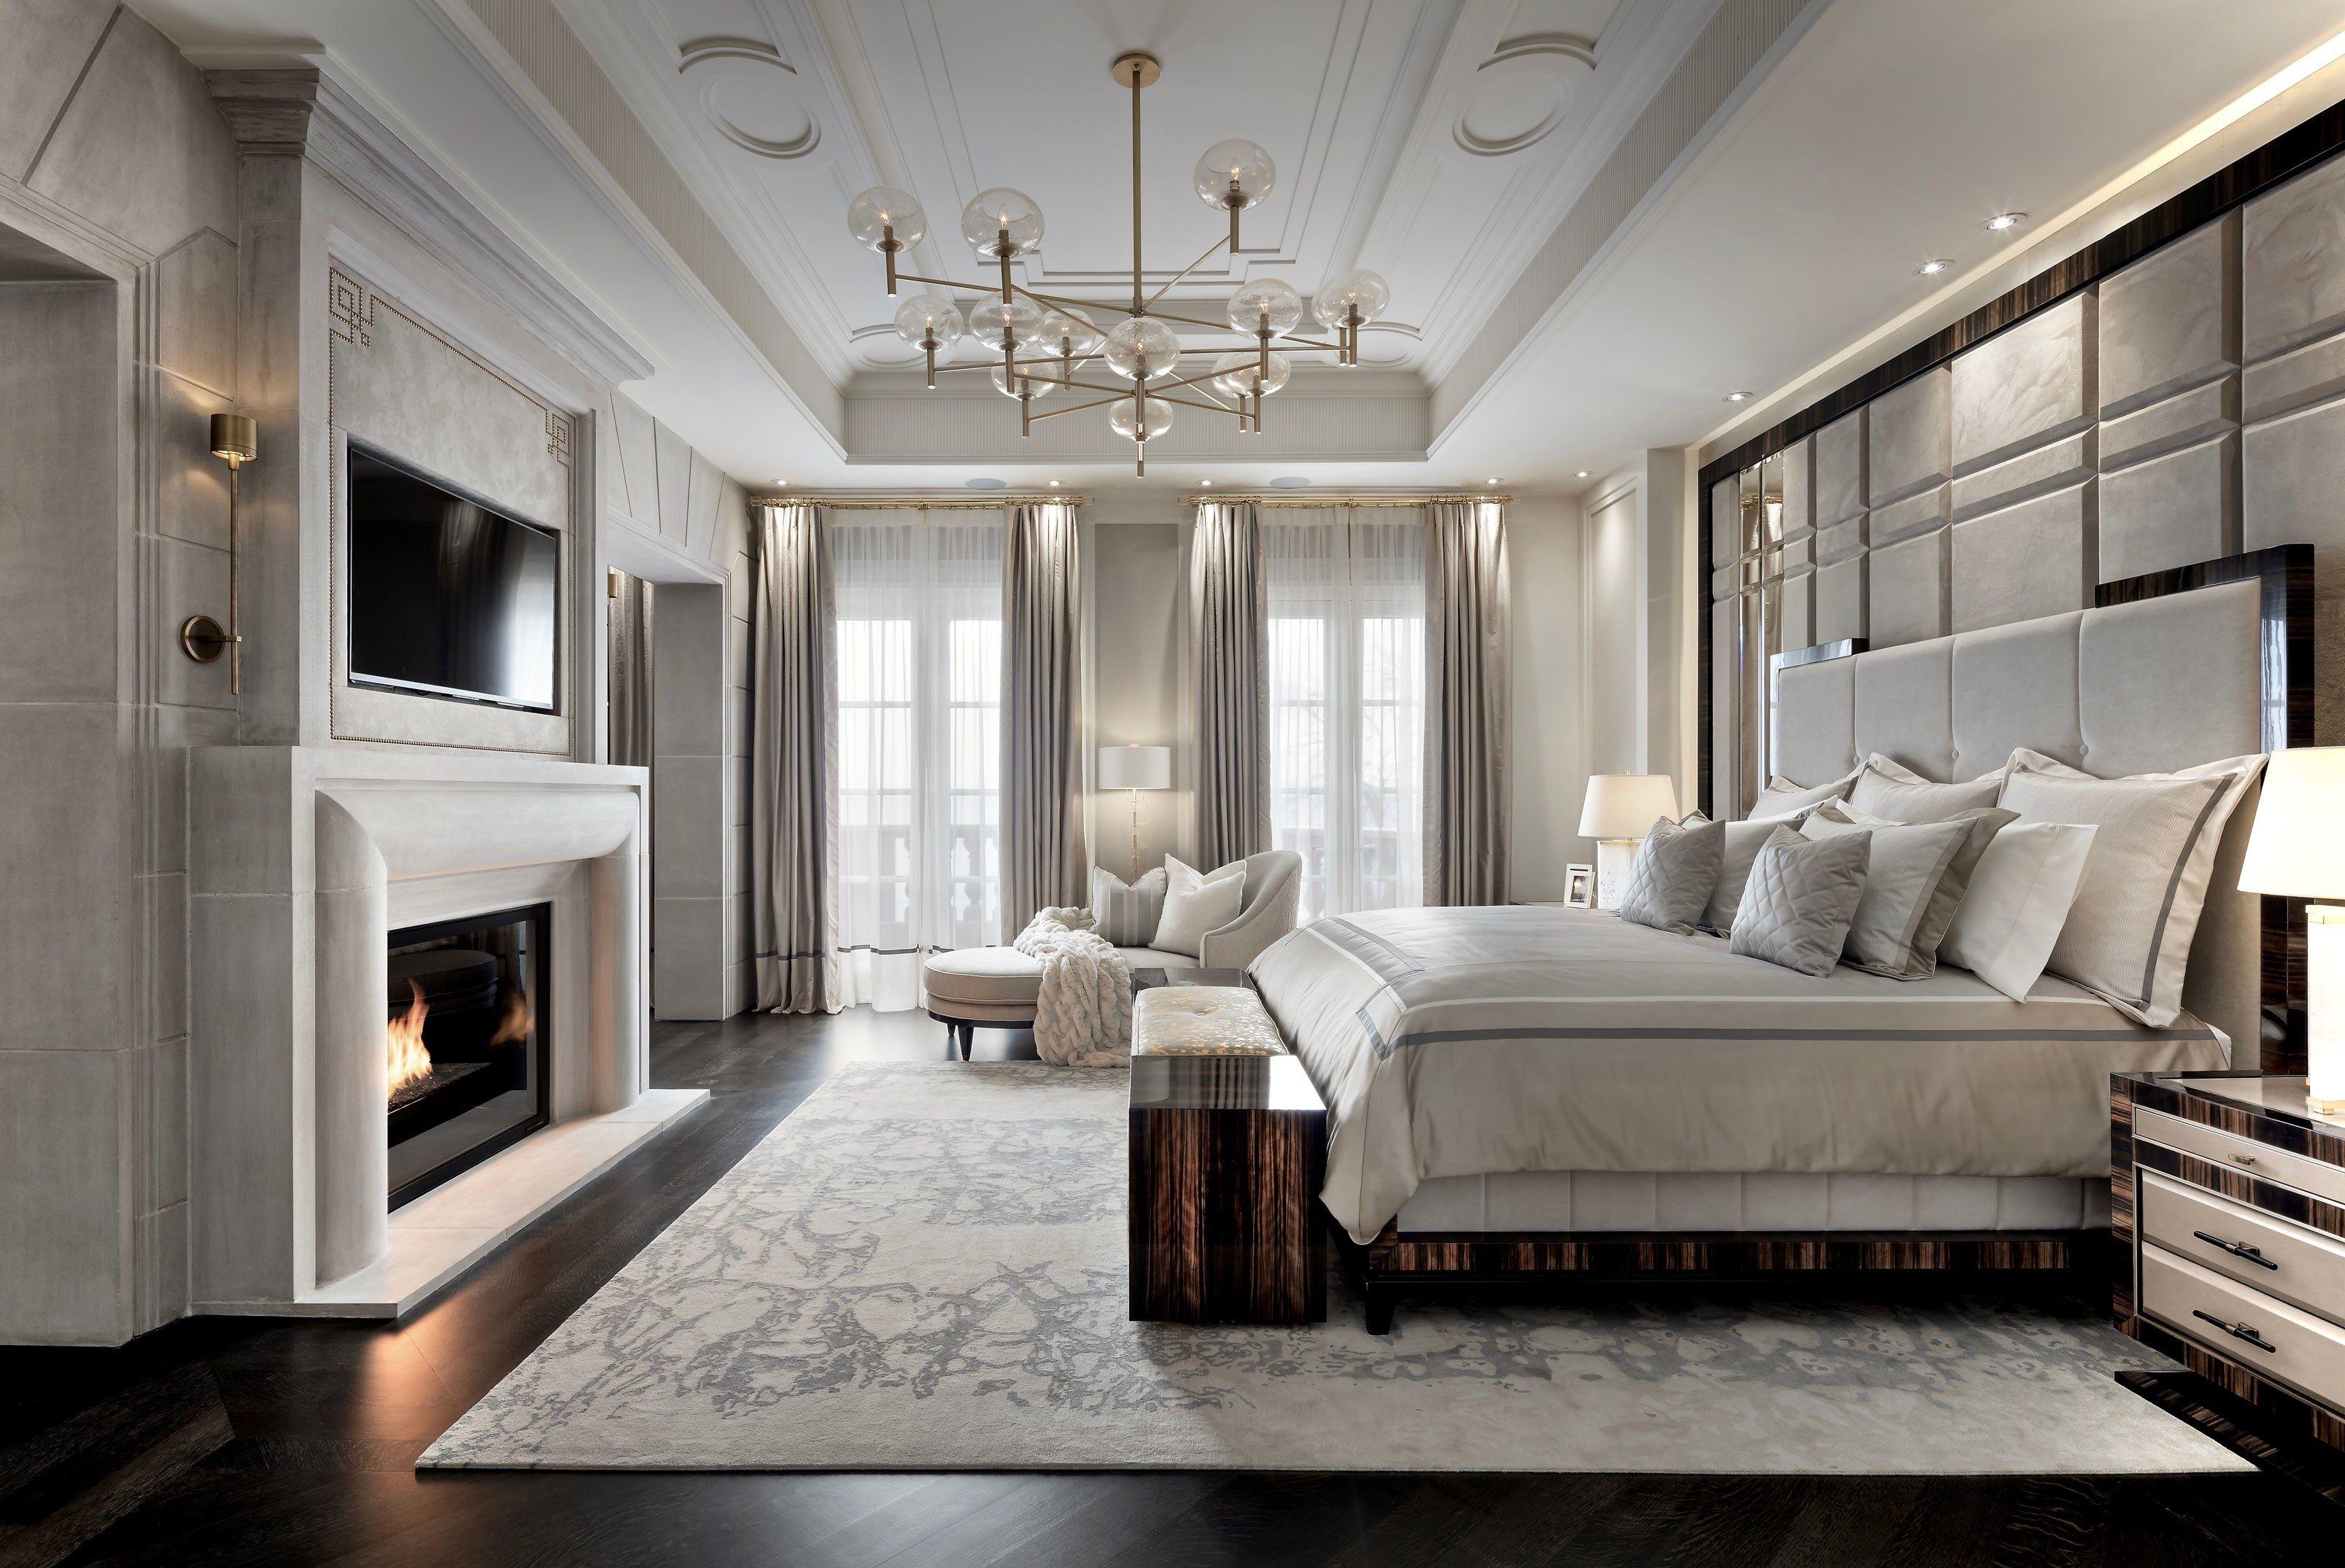 Ferris Rafauli The Iconic Designer In 2020 With Images Luxury